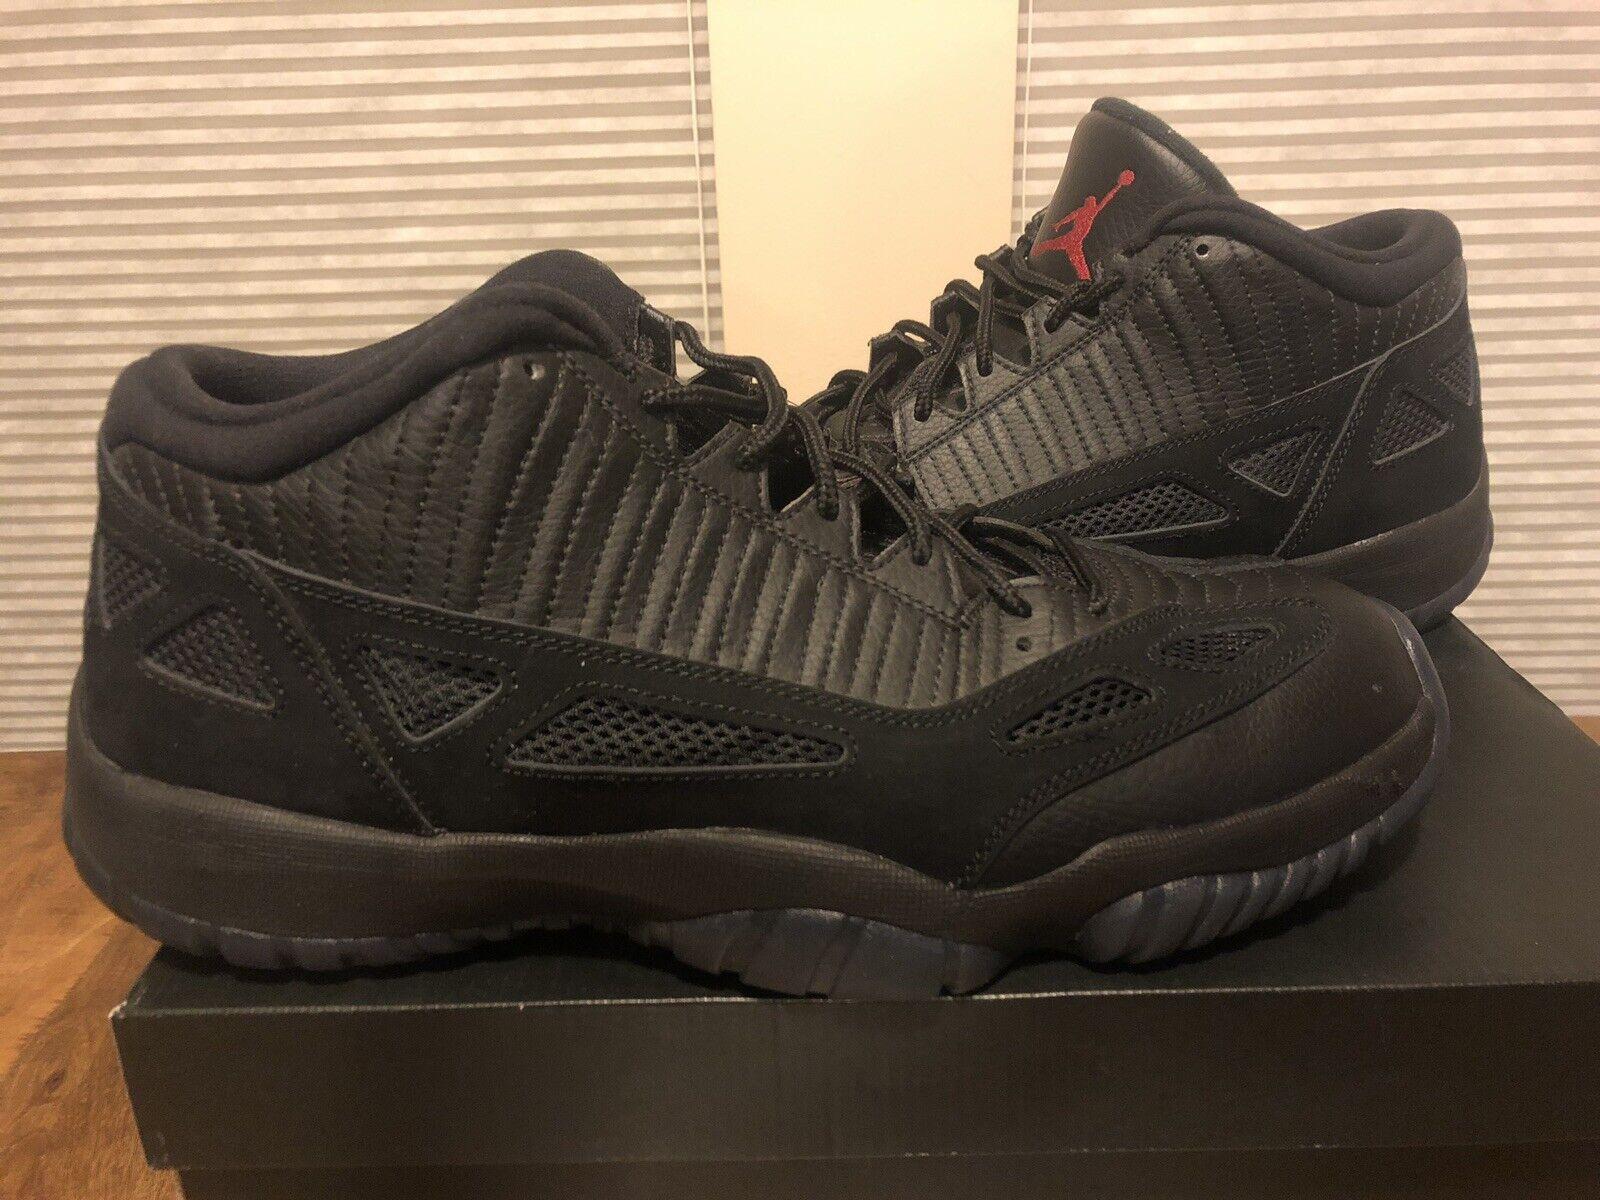 Nike Air Jordan Retro 11 Referee Low IE Sz 12